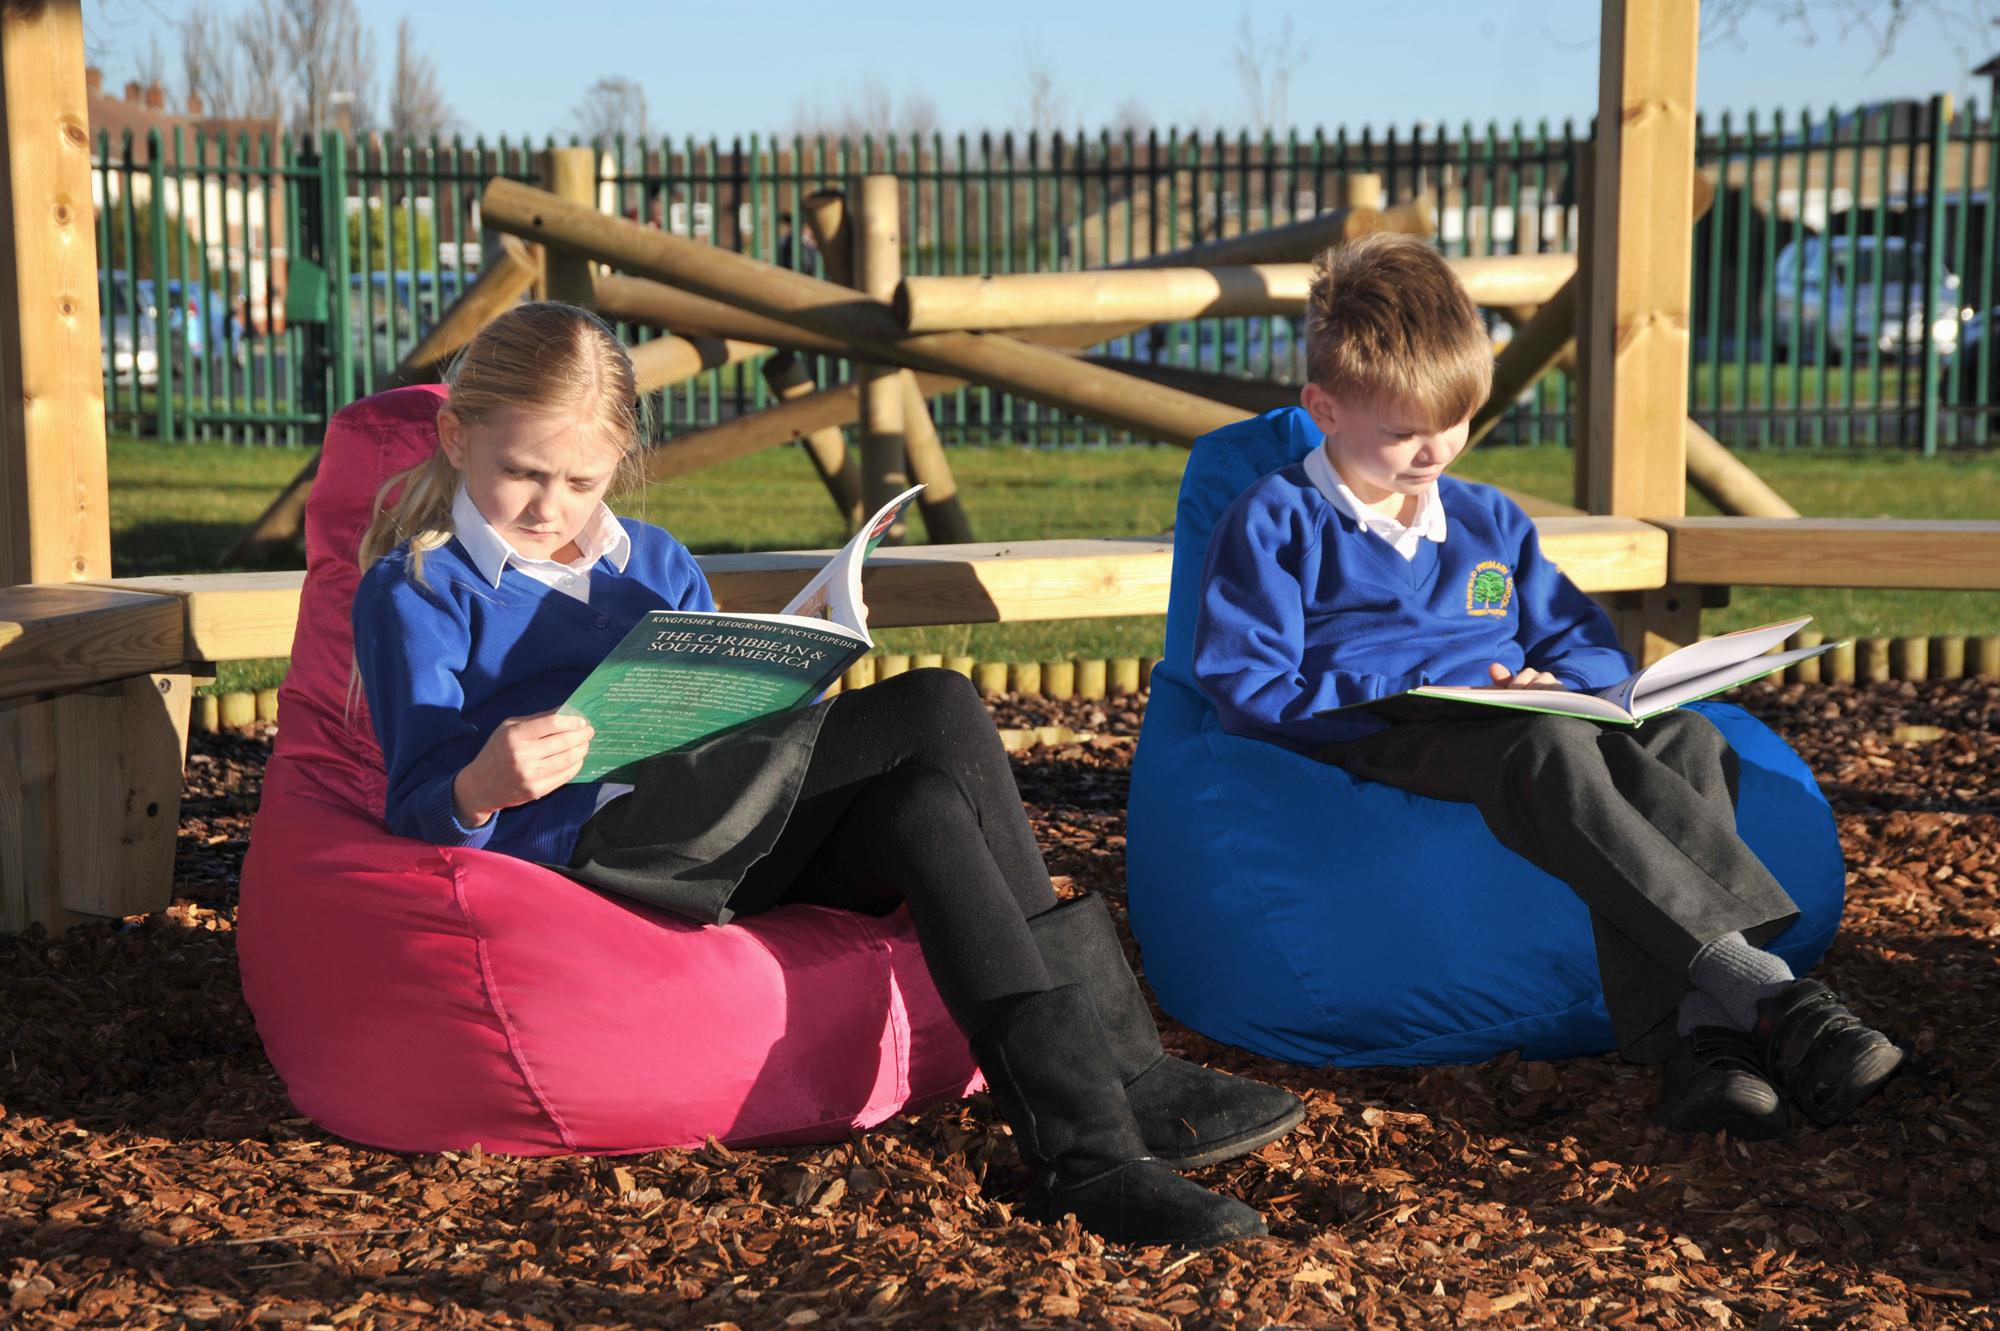 Eden-Kids-Reading-Pod-LFOD-1.jpg